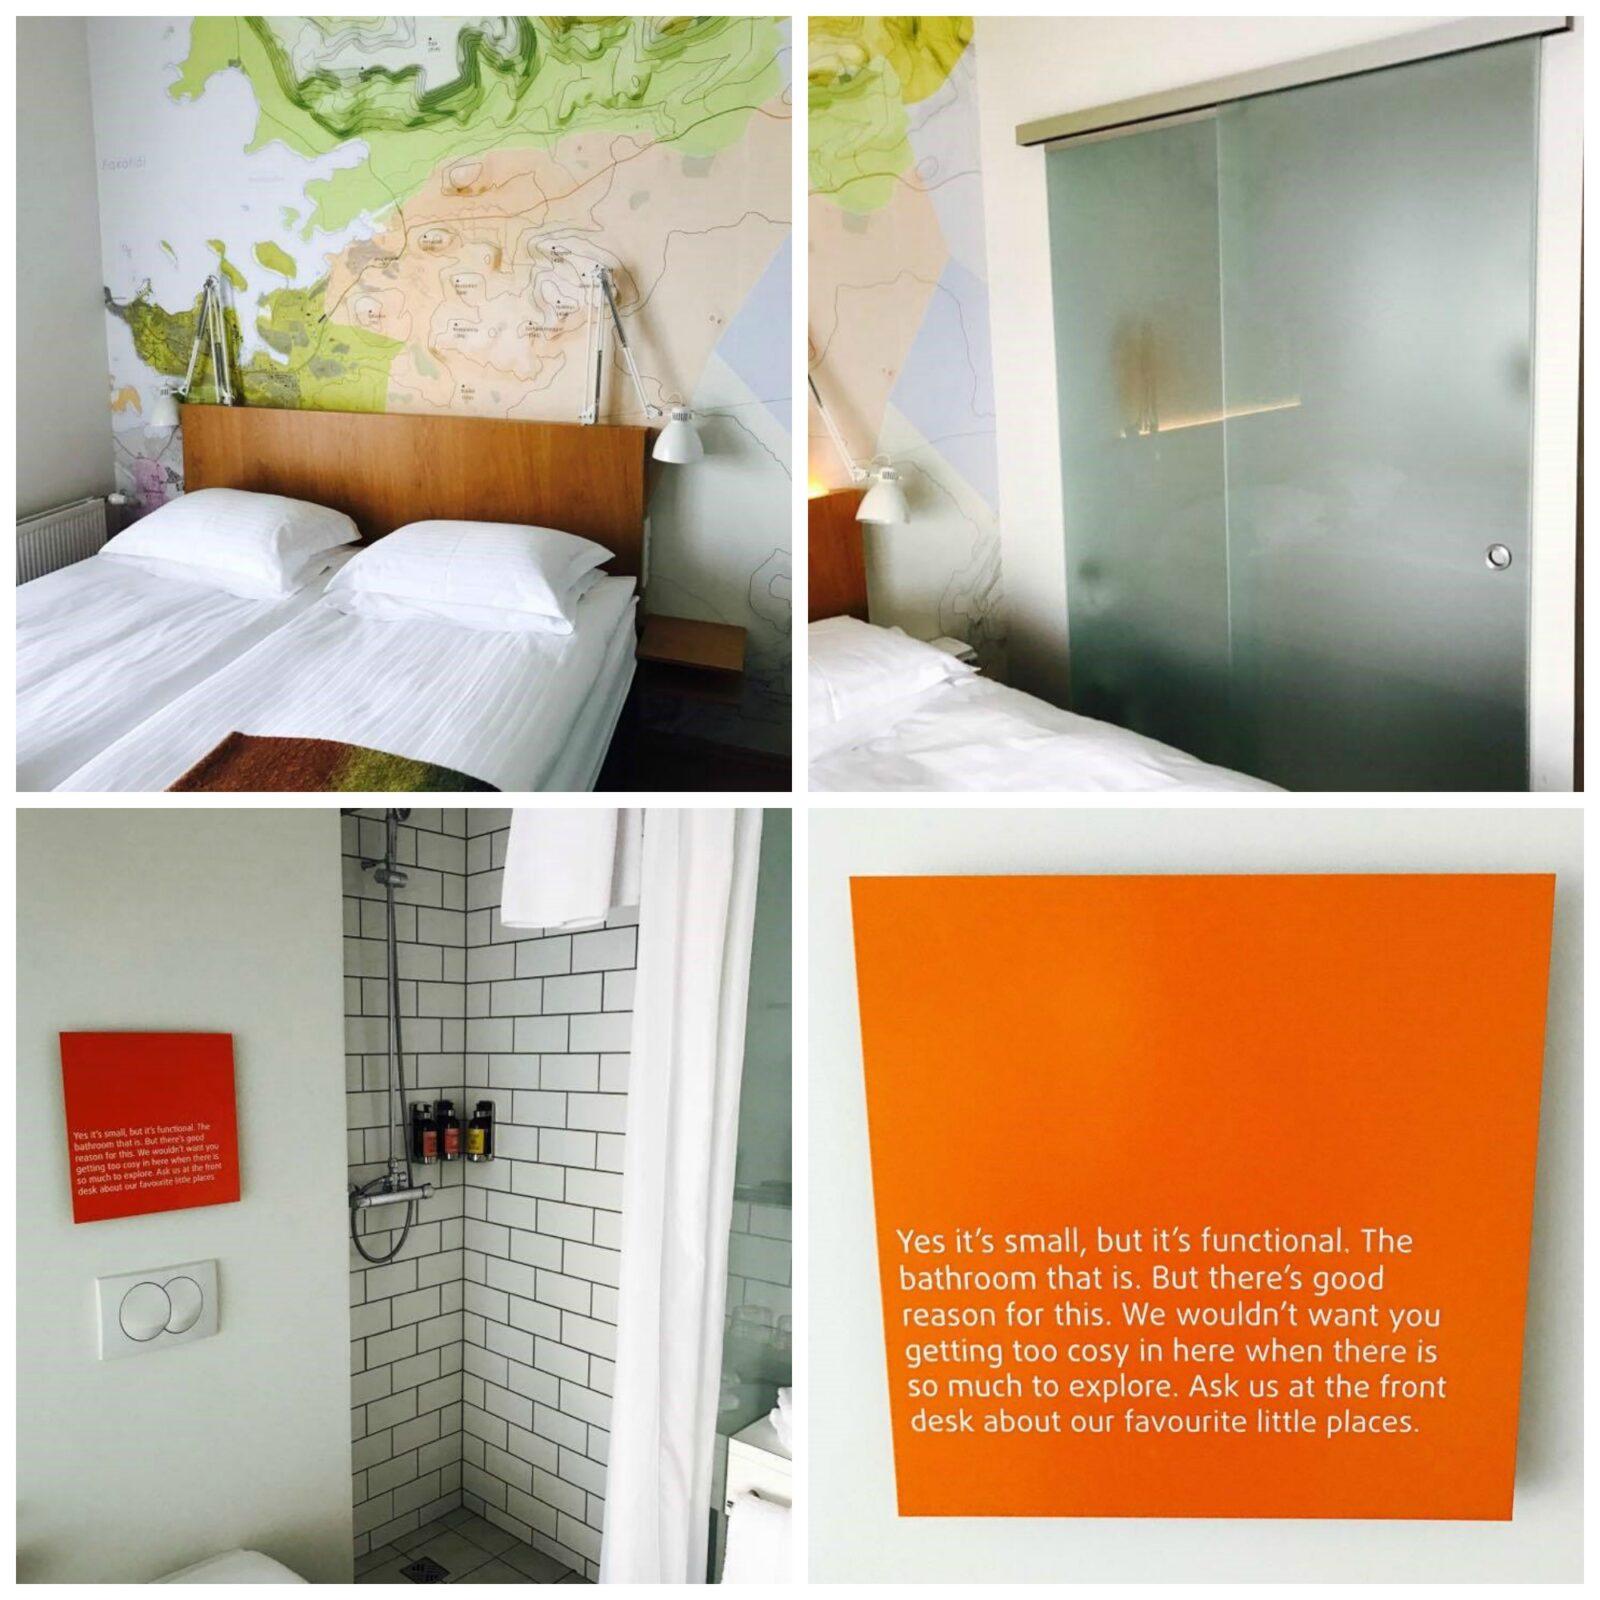 Bbed-Icelandair-Reykjavik-Marina-Room-Collage-2